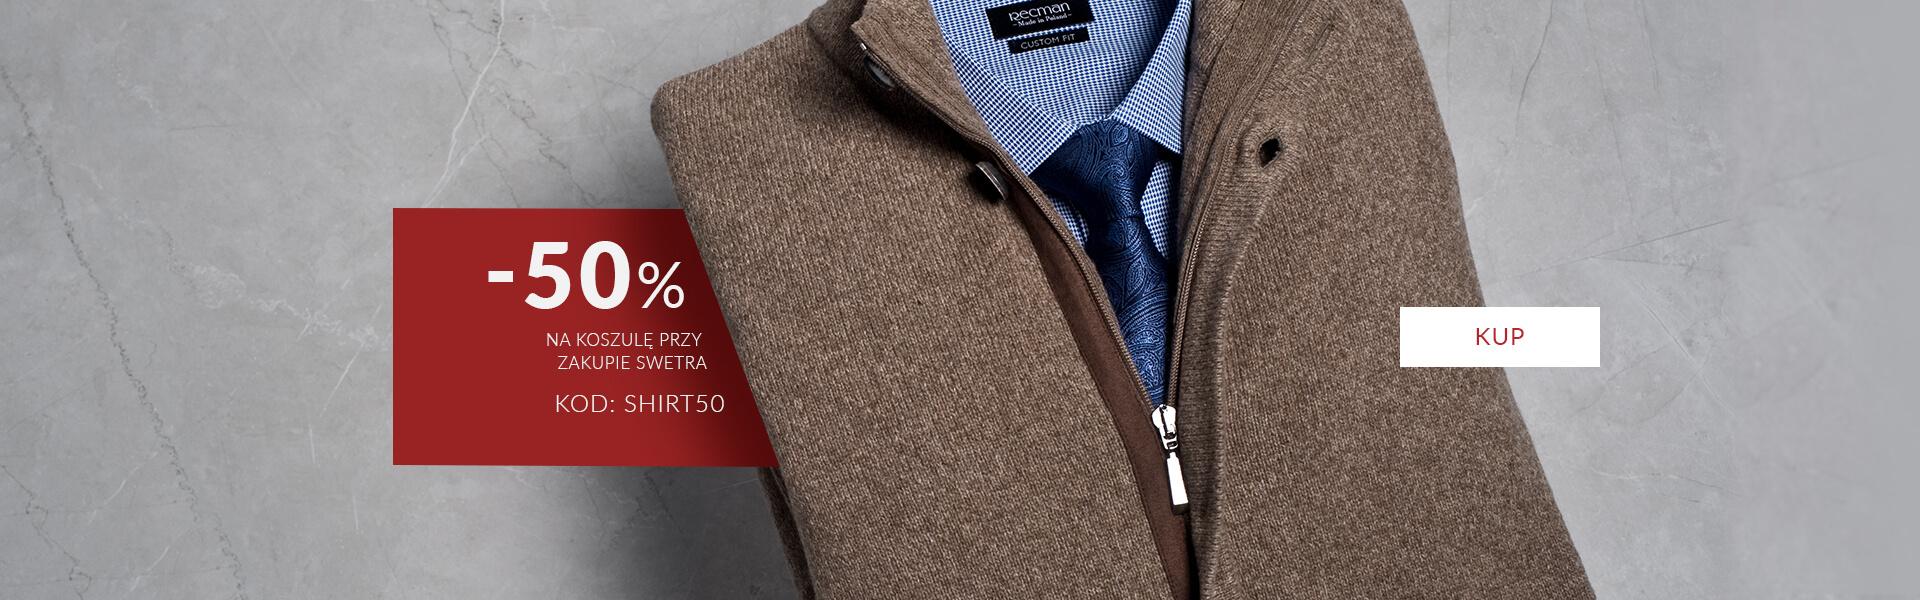 Koszula -50%